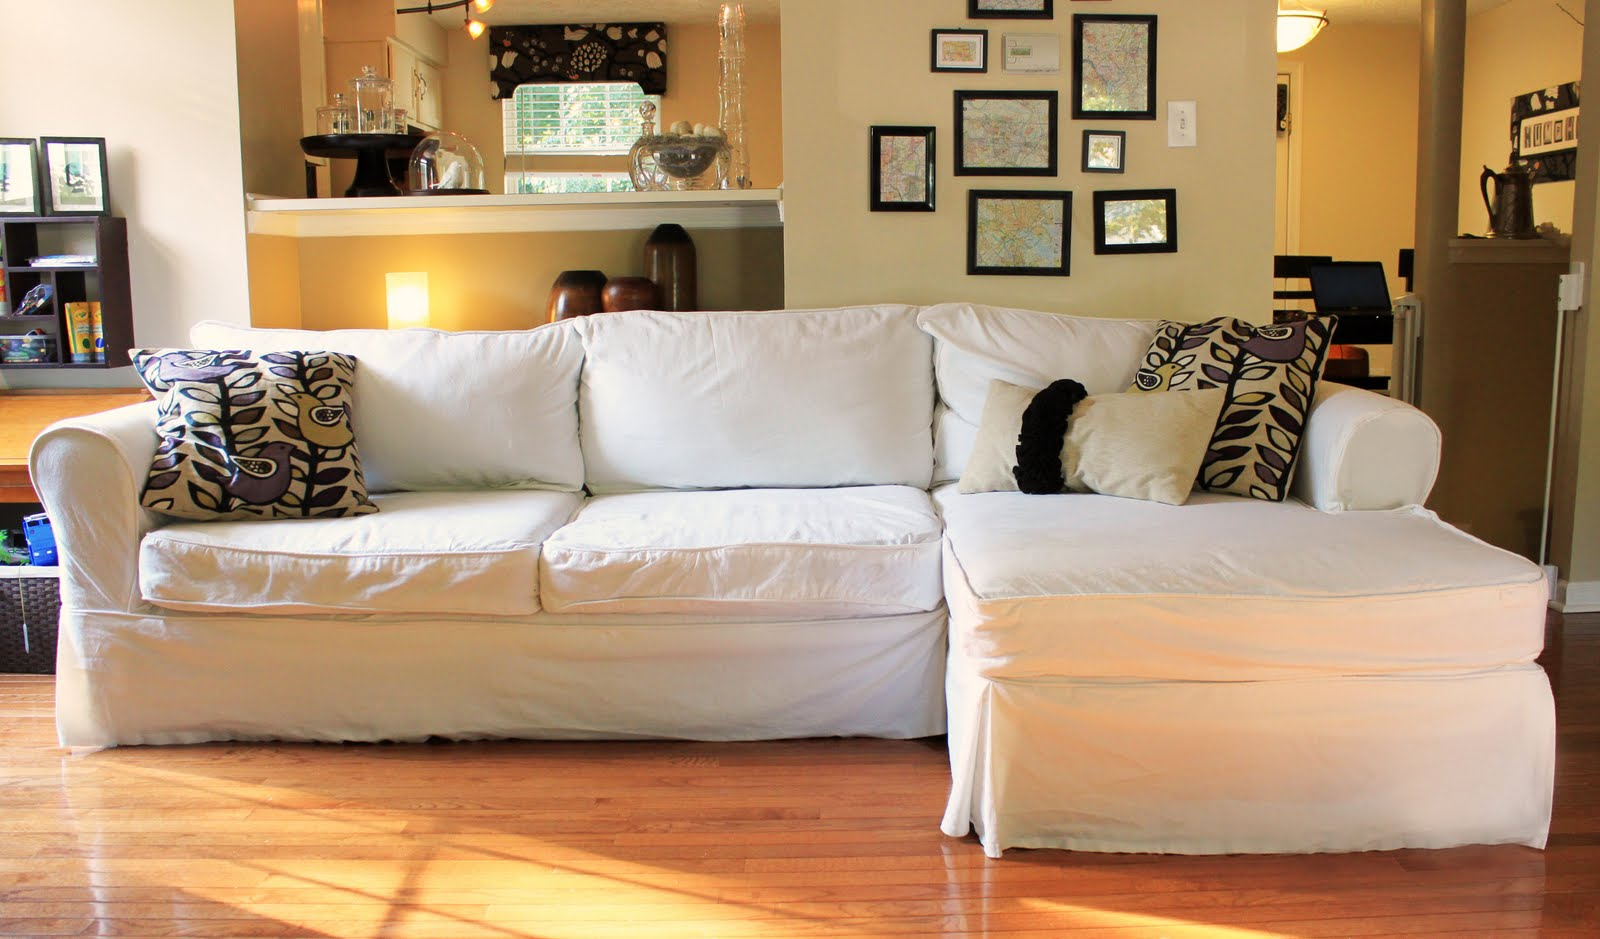 The Creative Imperative Nasty Sofa Slipcover It